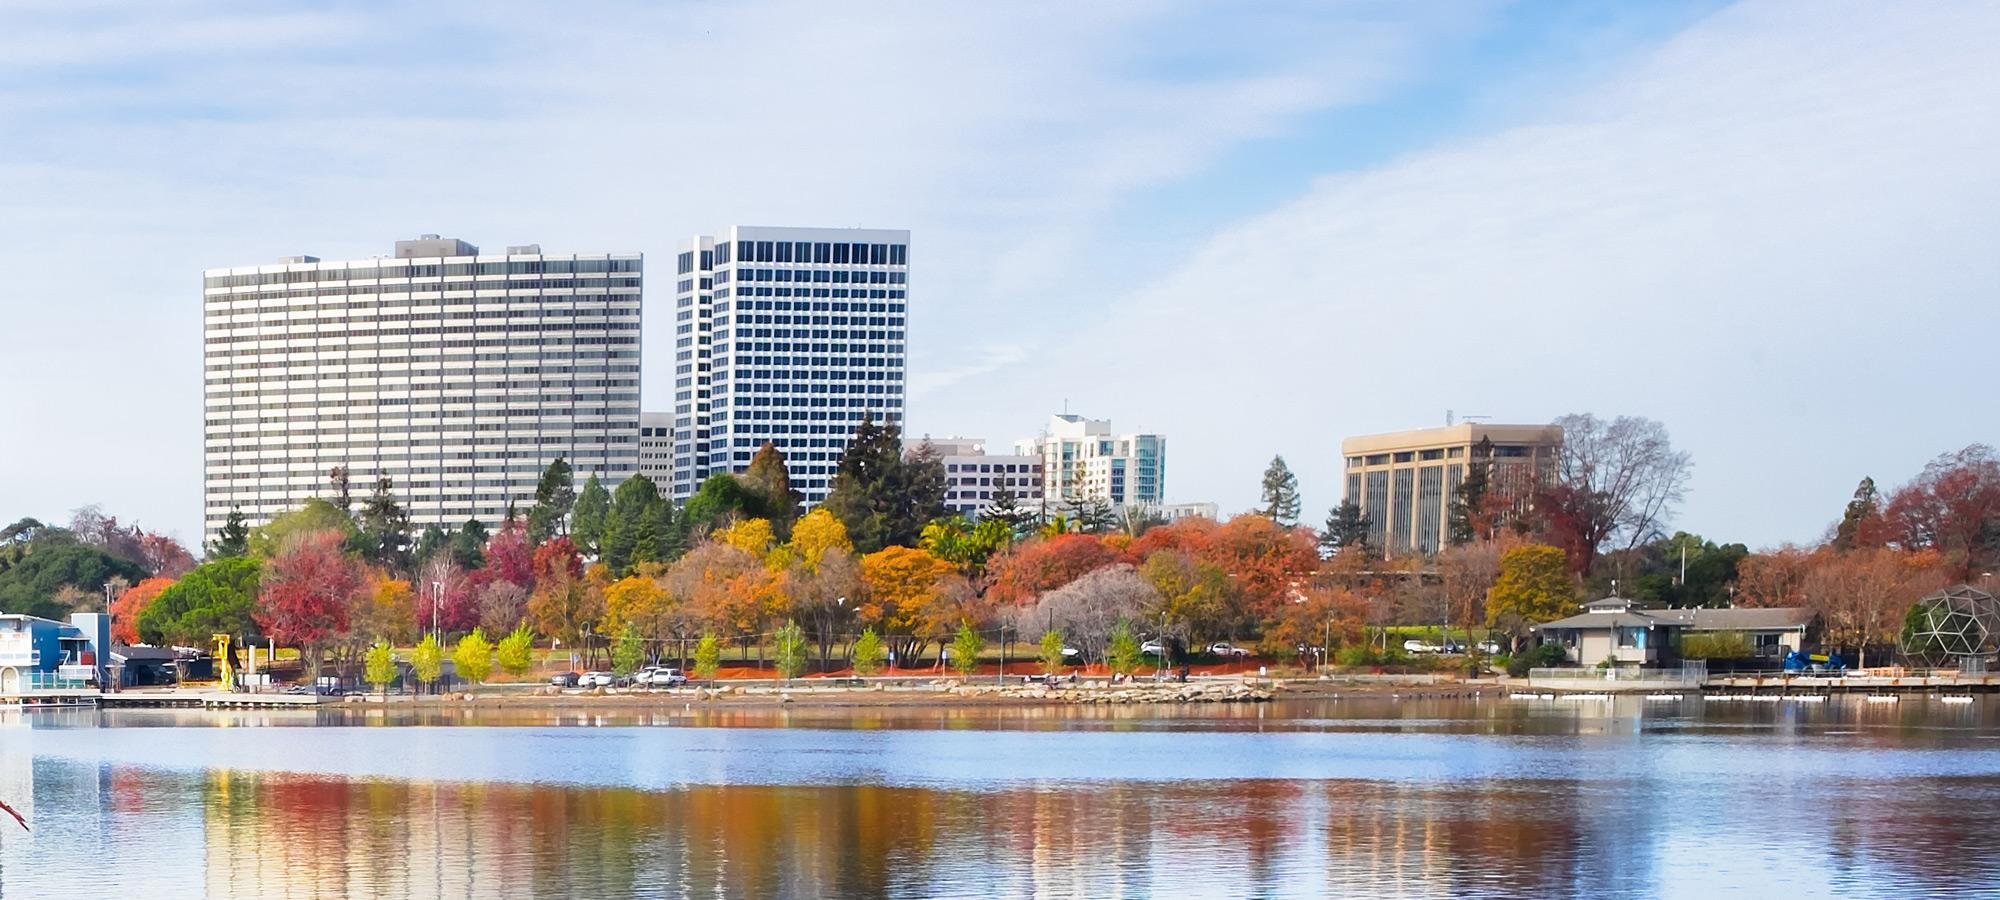 Oakland CA skyline